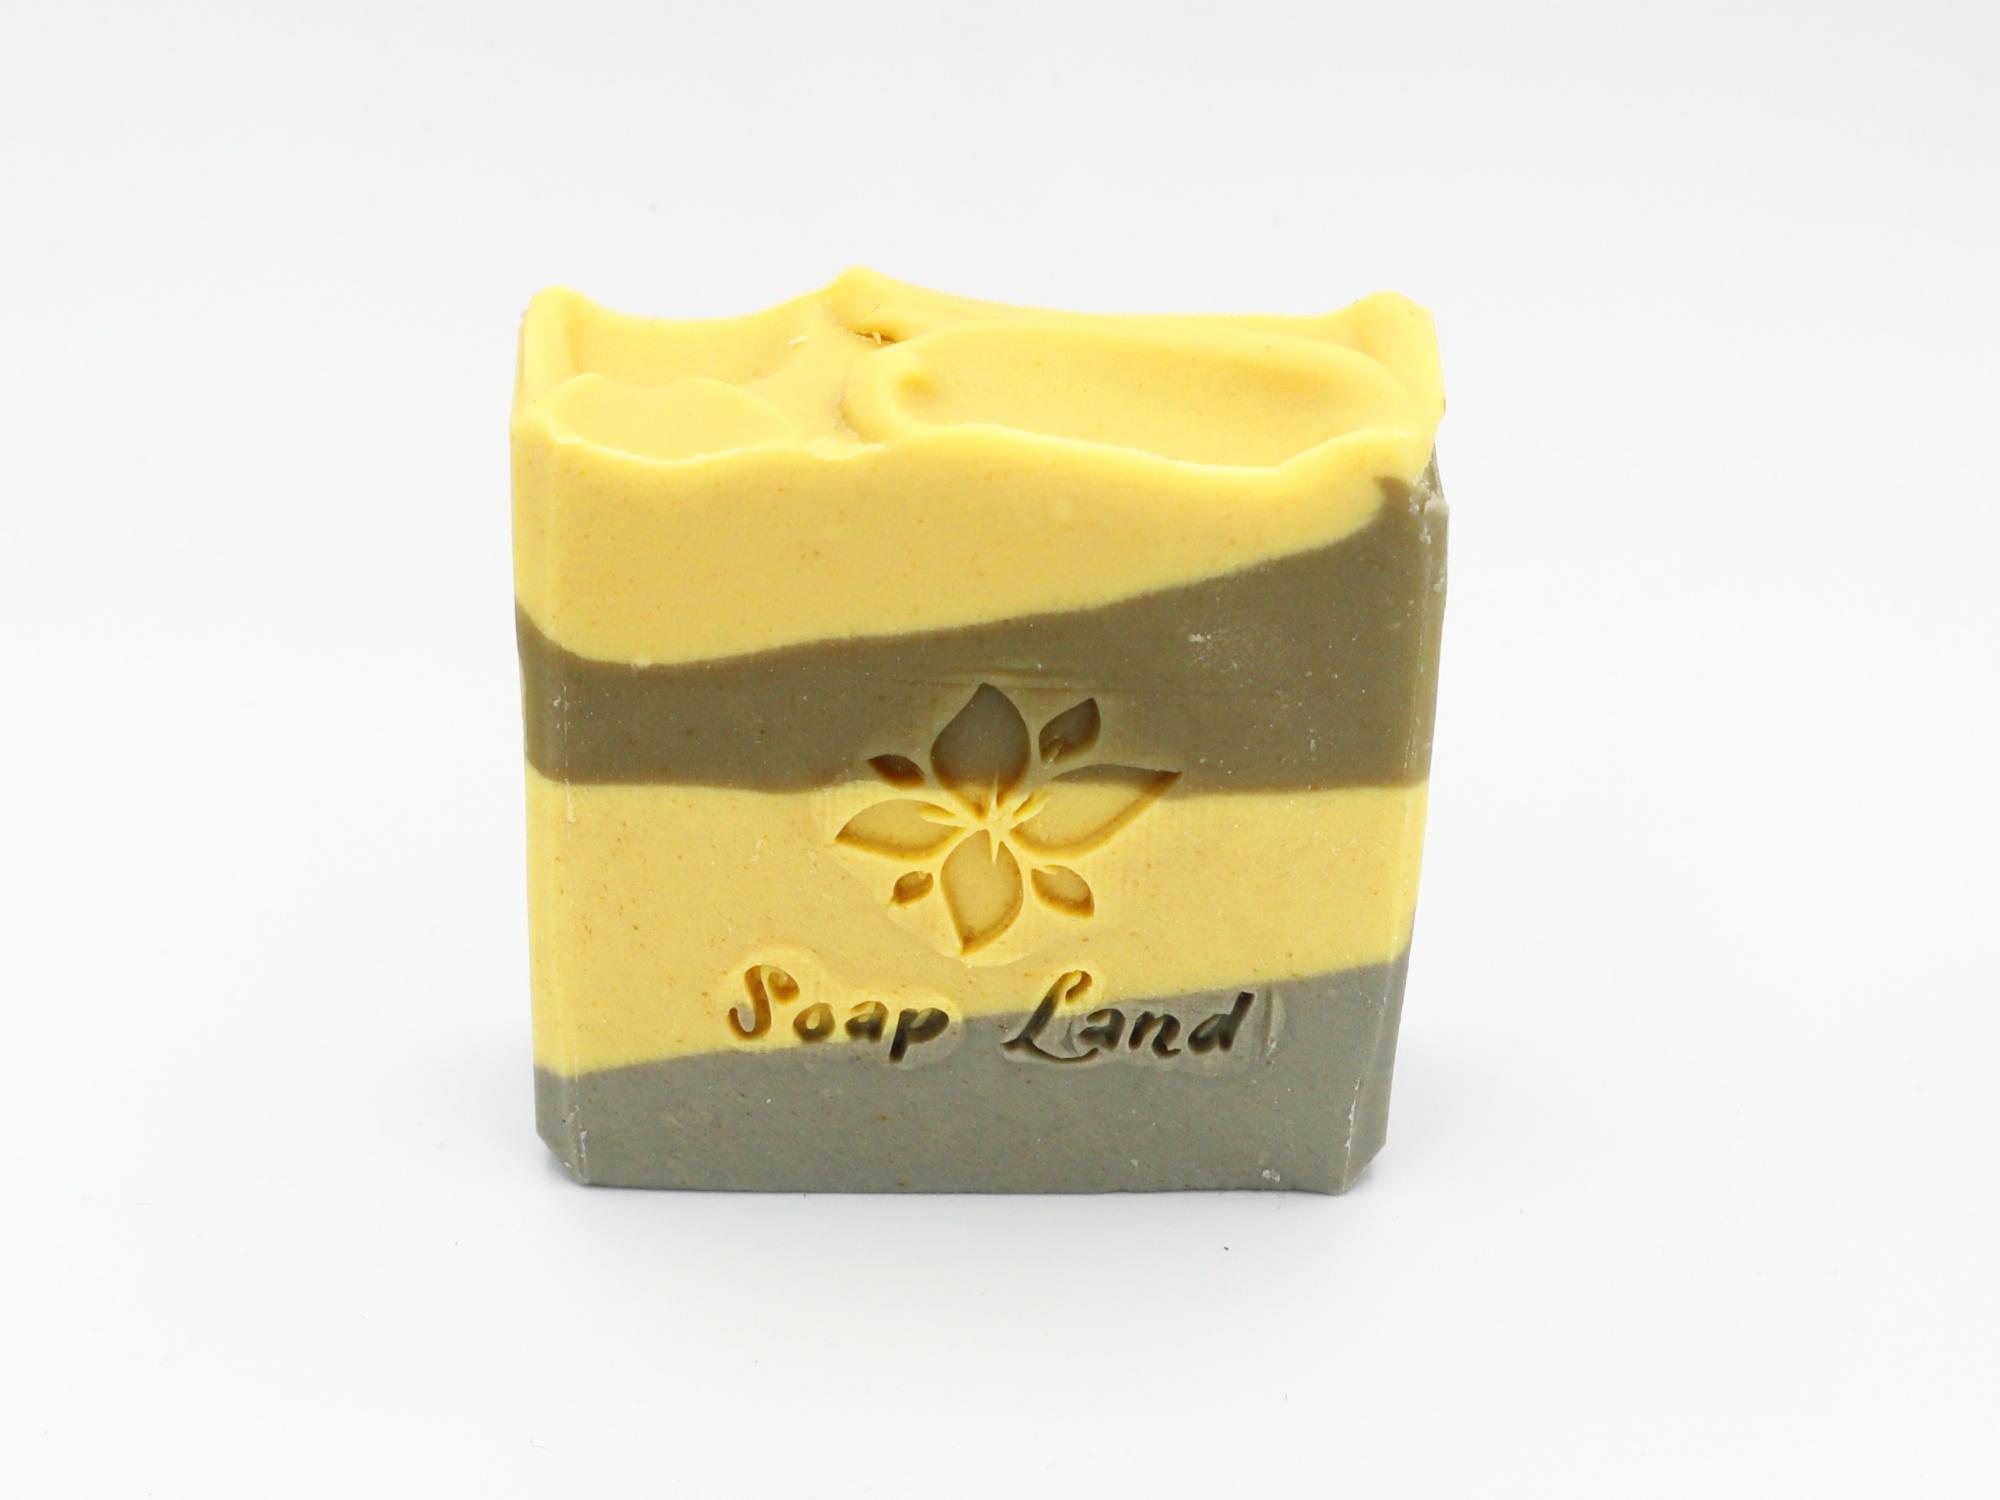 Soap Land Lemongrass Soap with Goat Milk